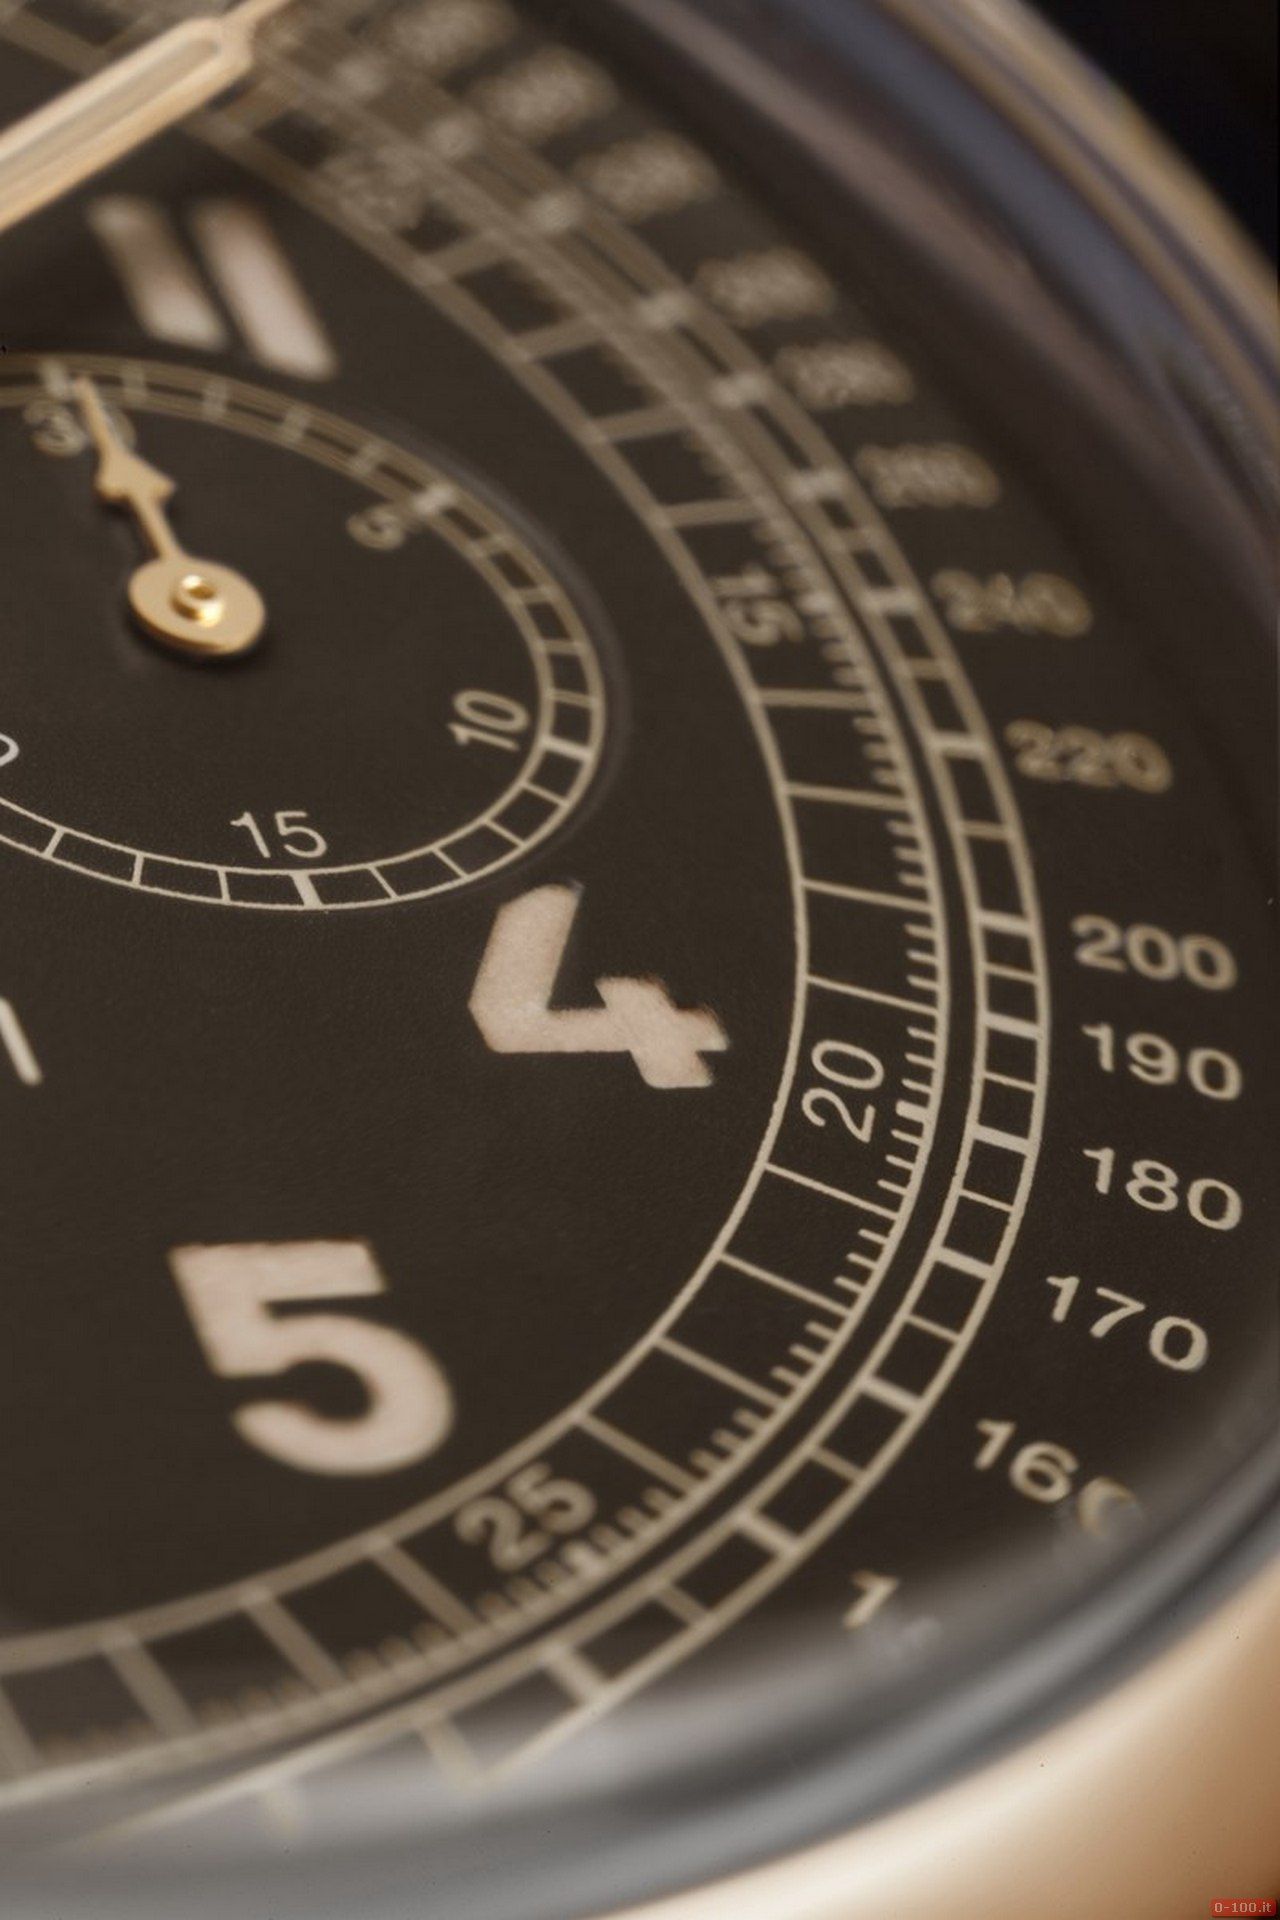 sihh-2014-panerai-radiomir-1940-chronograph-collection-limited-edition_0-100_20